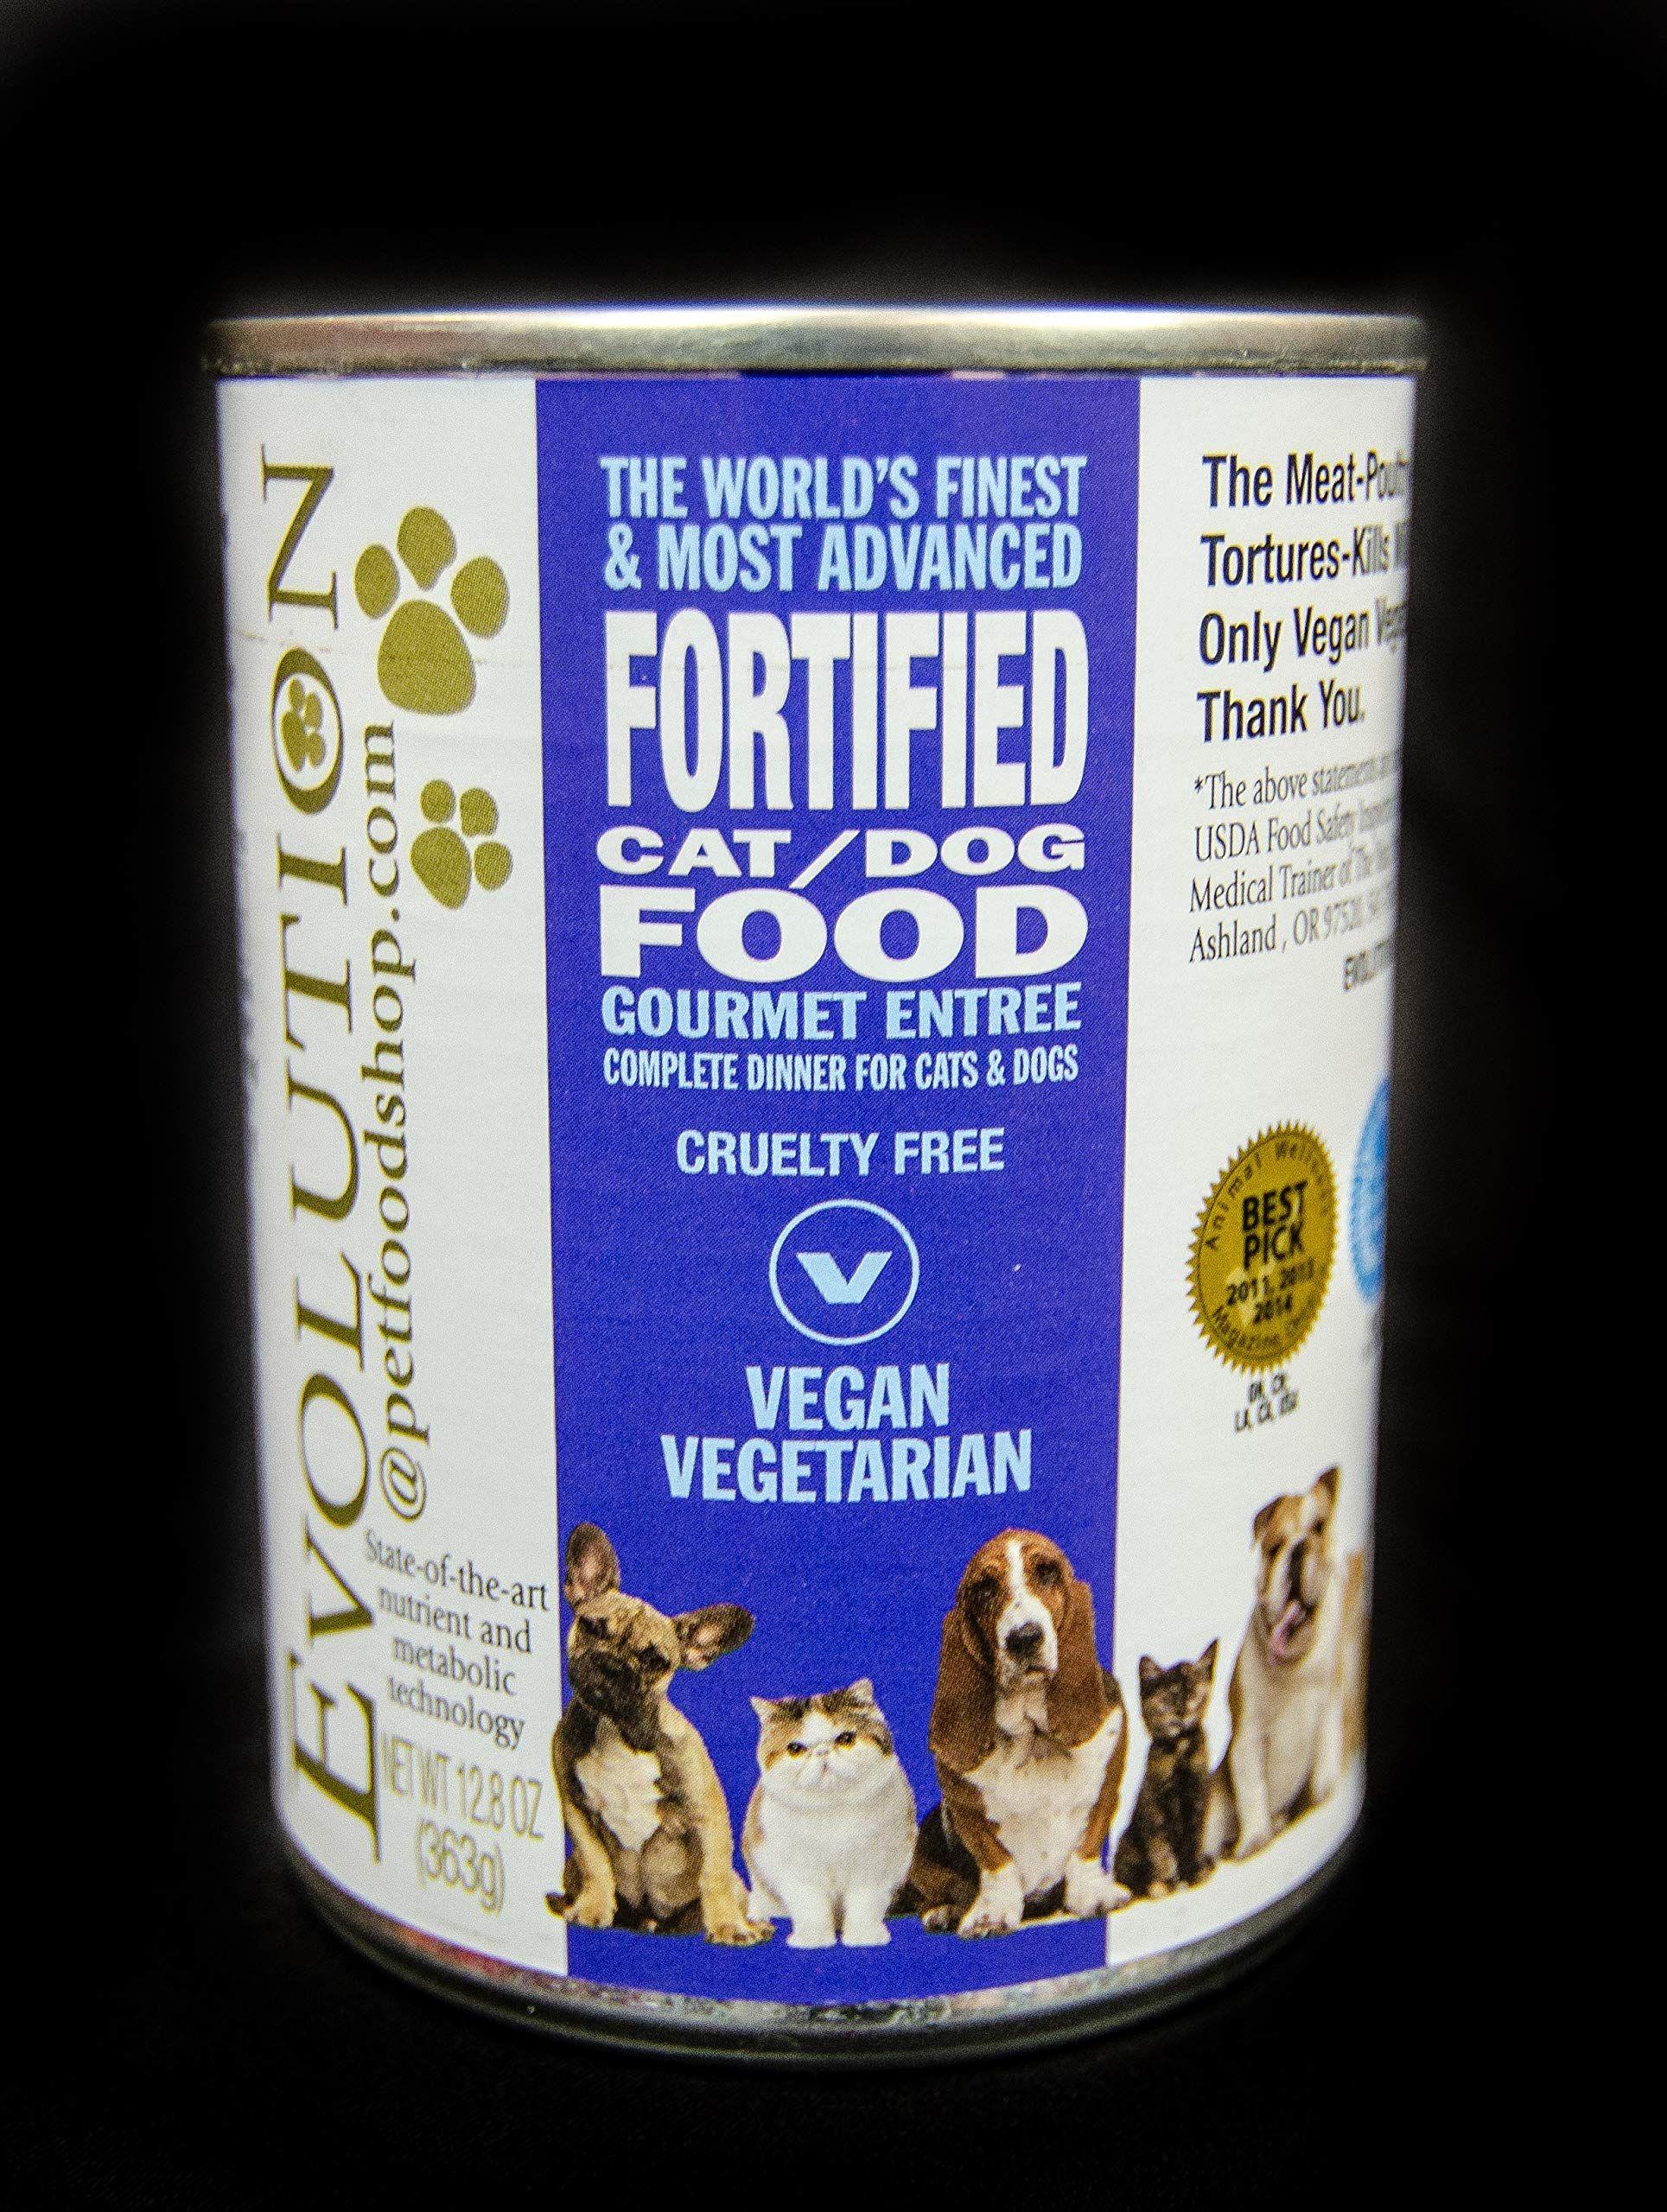 Evolution Diet Gourmet Entree Moist In 2020 Gourmet Entrees Dog Food Recipes Best Cat Food